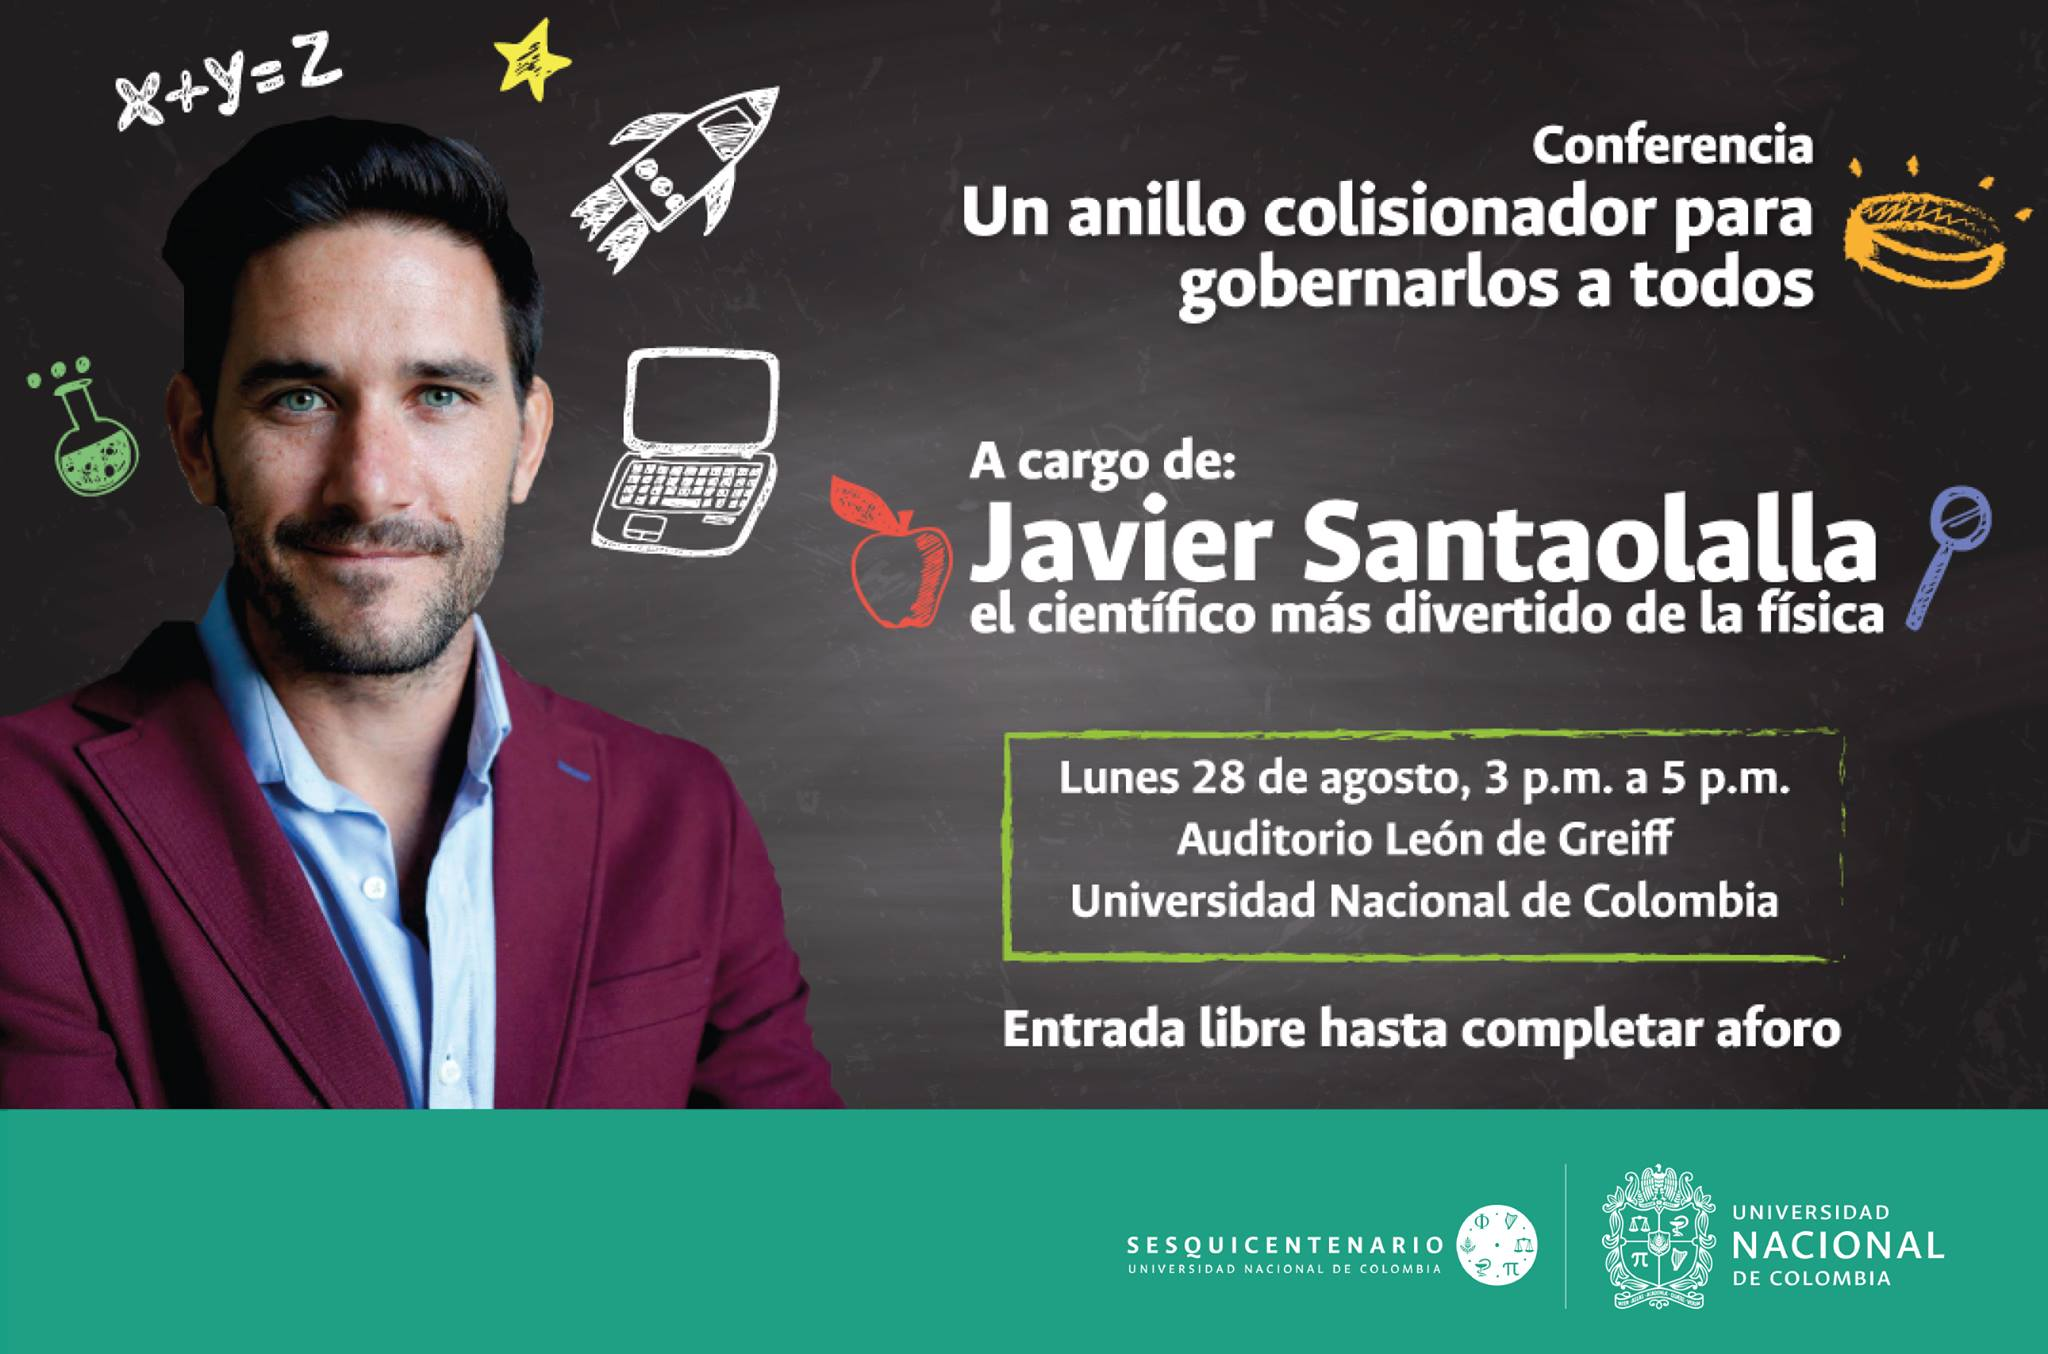 Conferencia «Un anillo colisionador para gobernarlos a todos» (Javier Santaolalla)